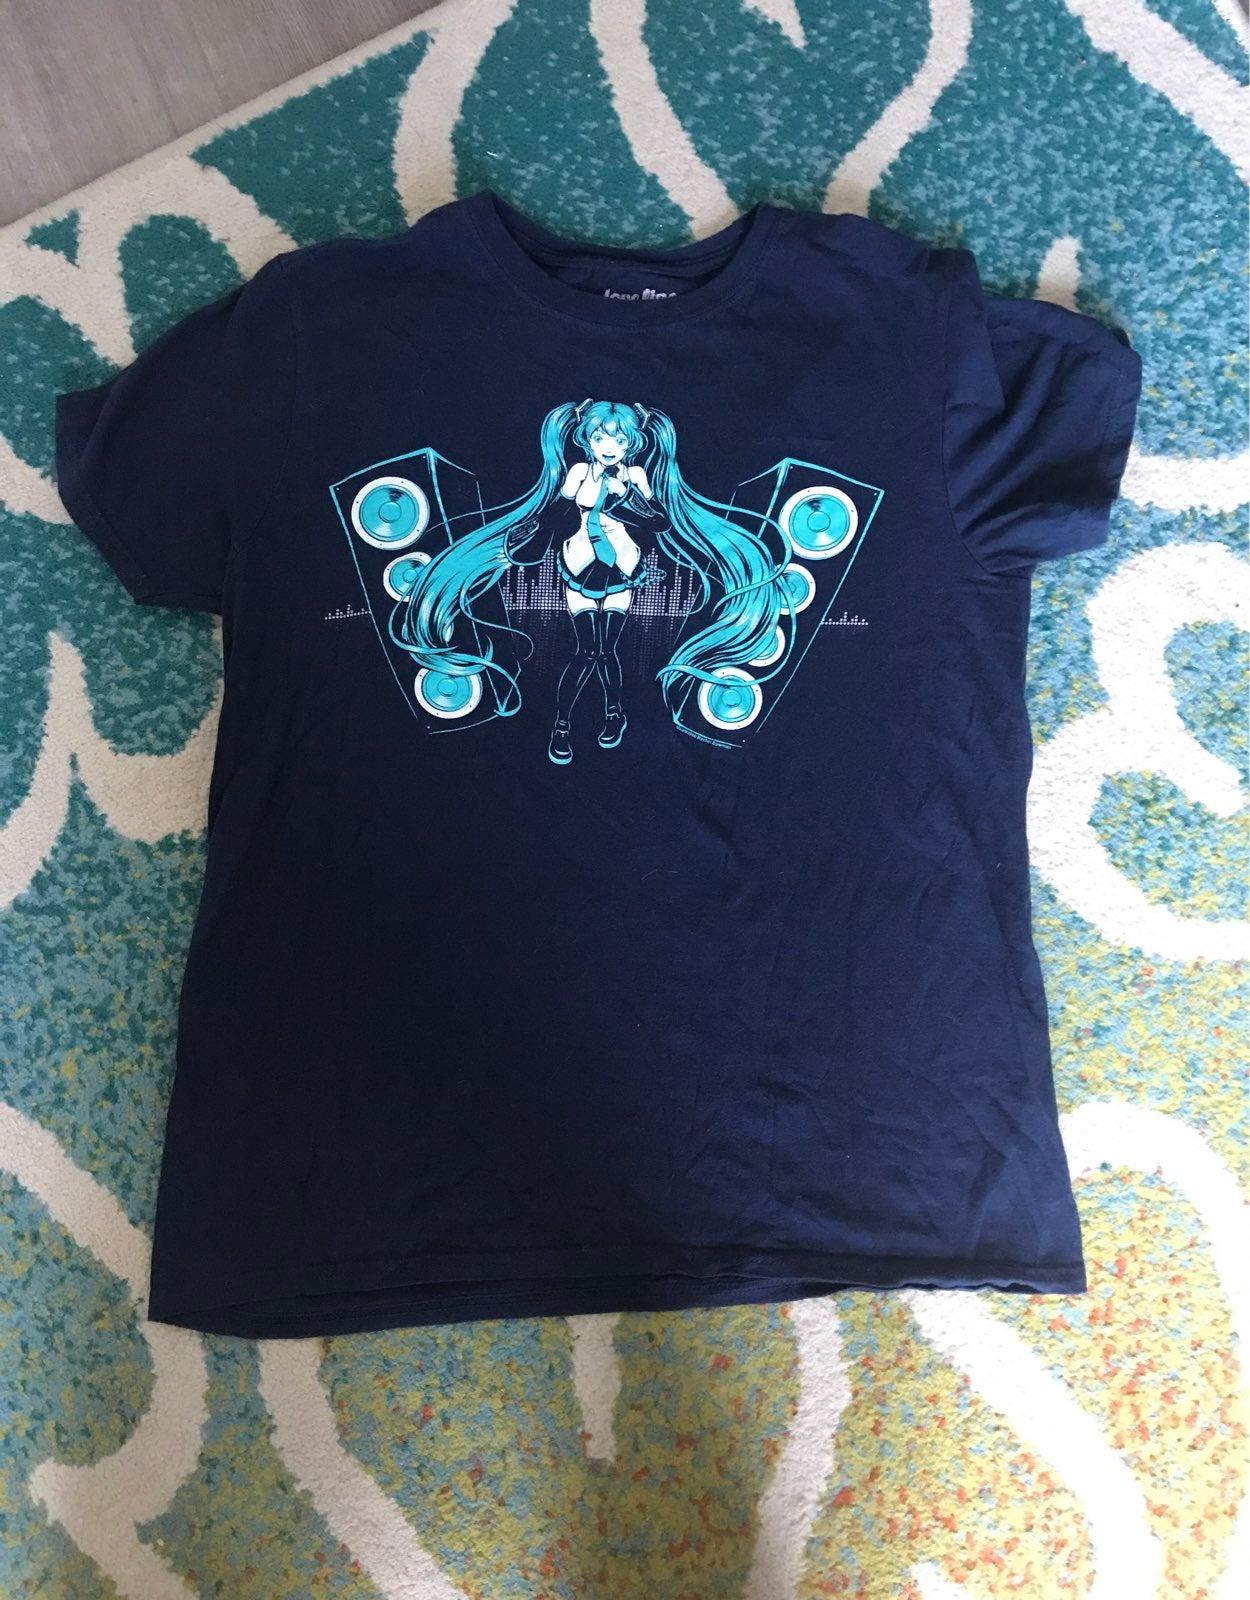 Hatsune Miku WeLoveFine Shirt